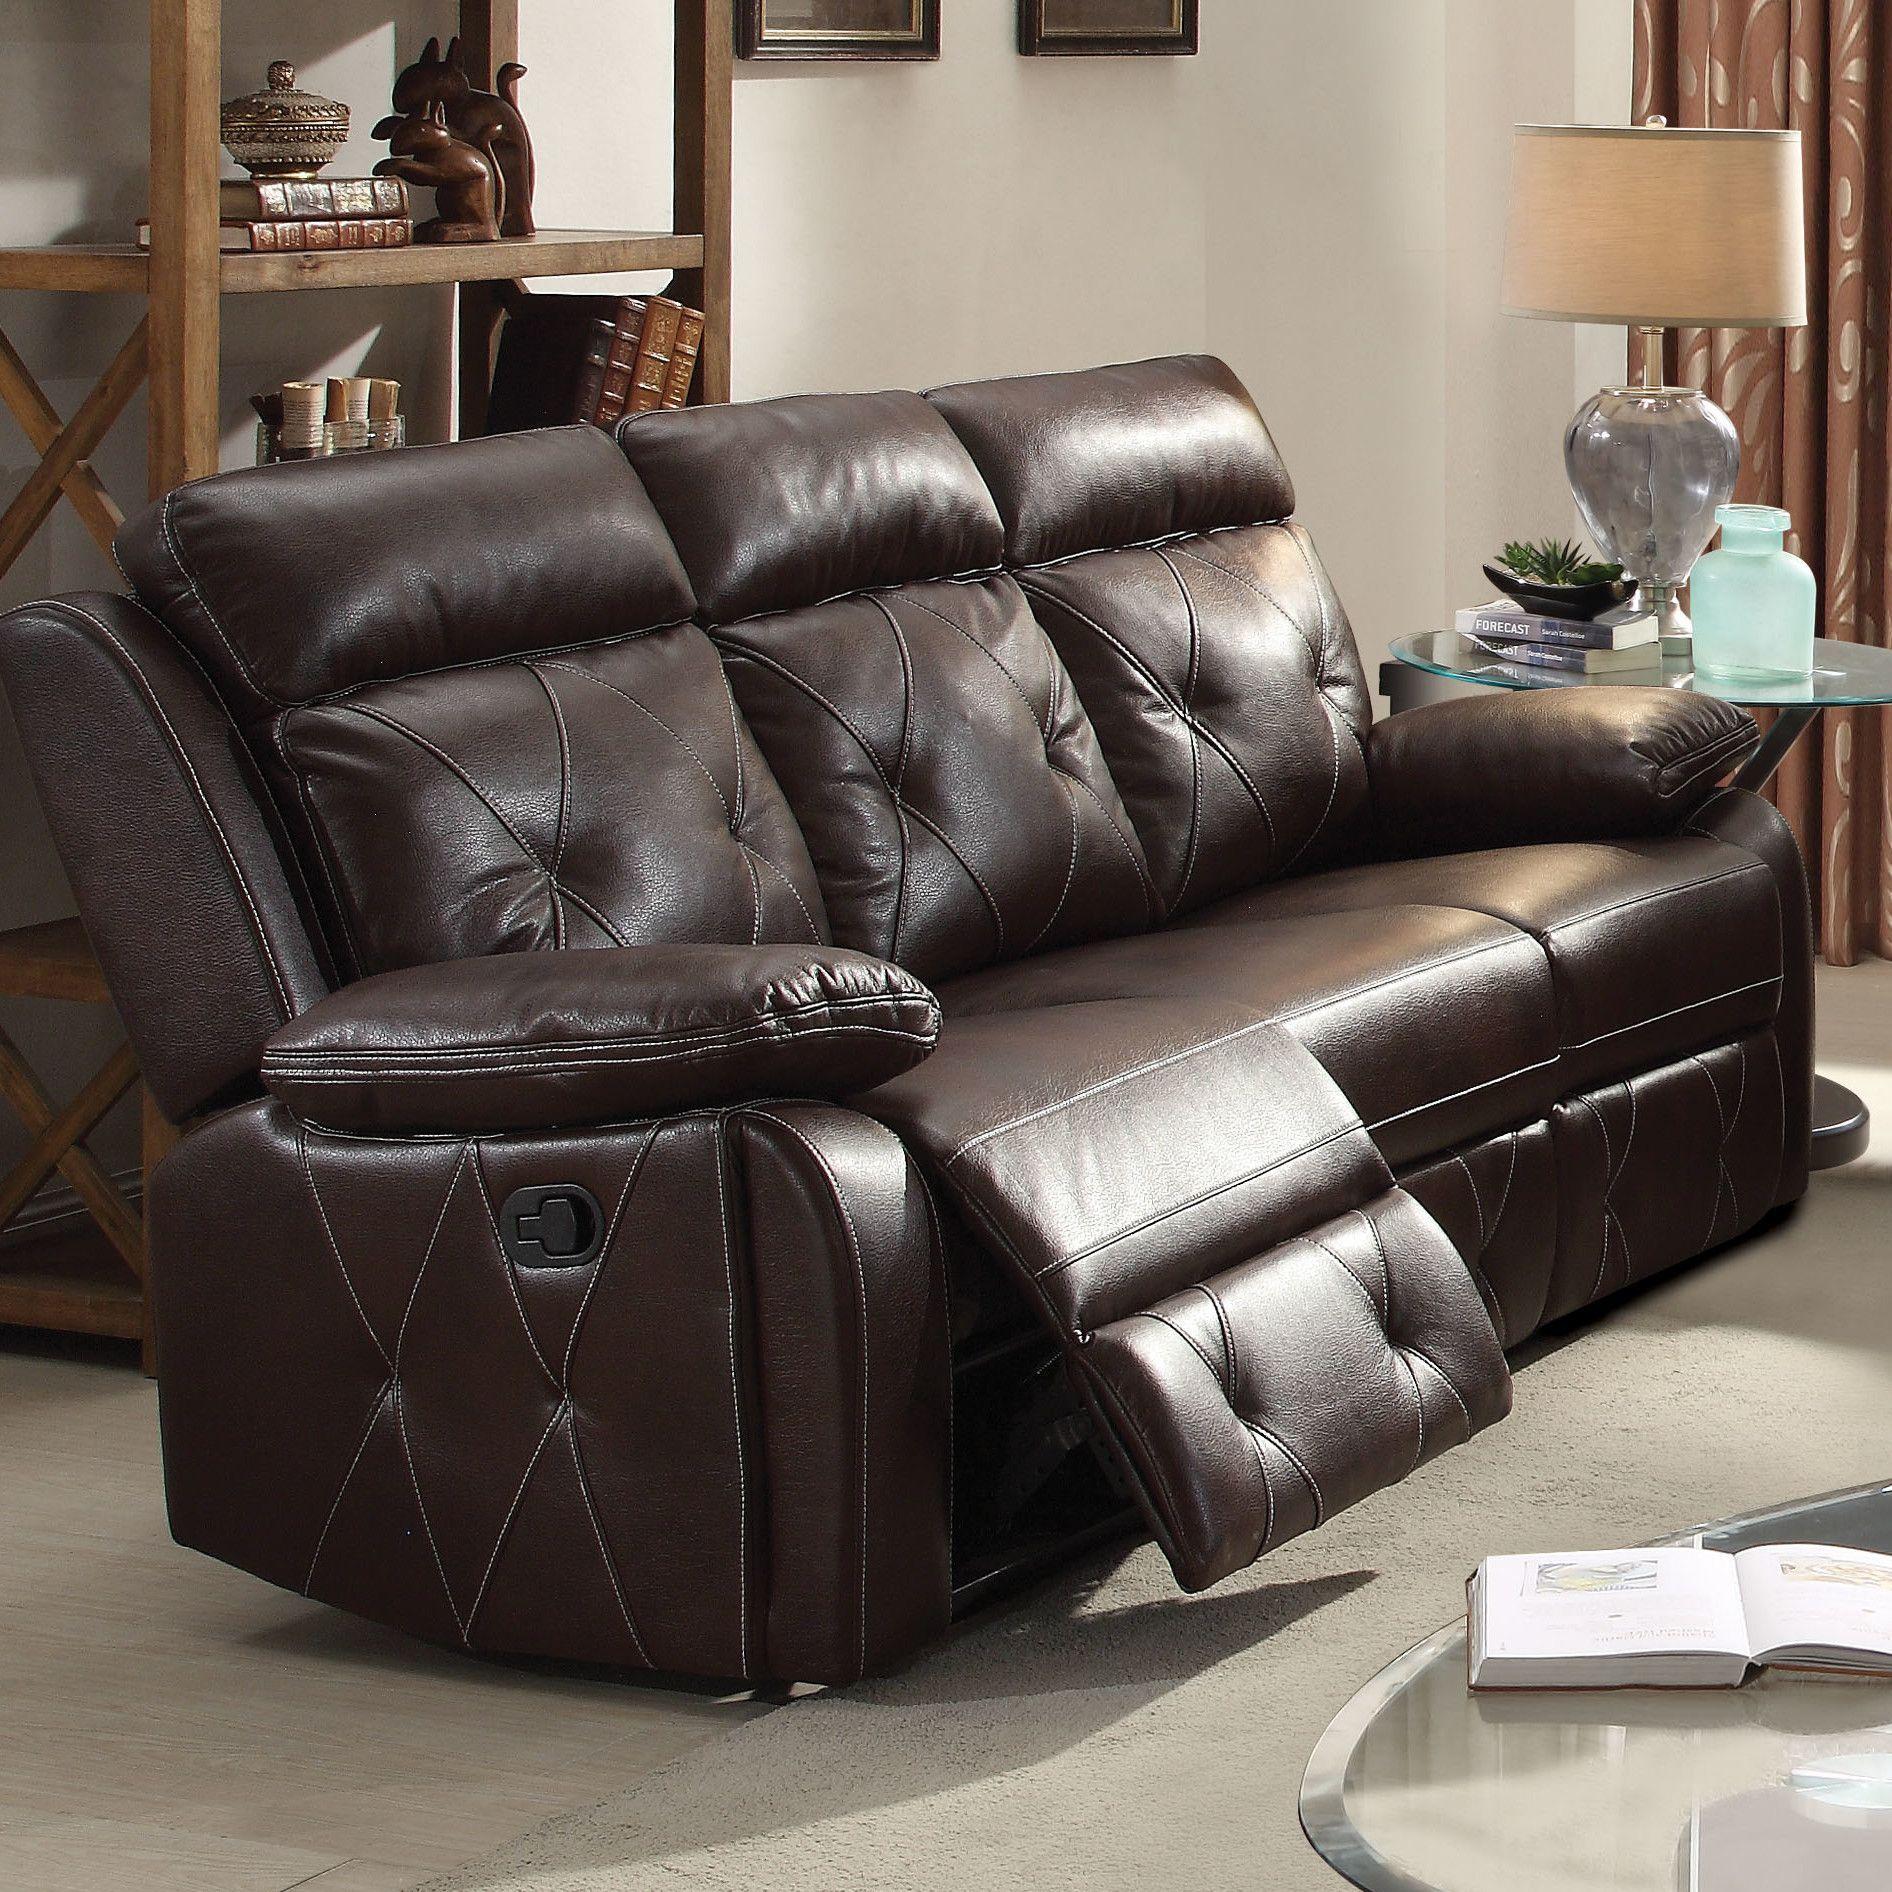 Geva Motion Sofa Acme Furniture Cheap Furniture Stores High Quality Furniture